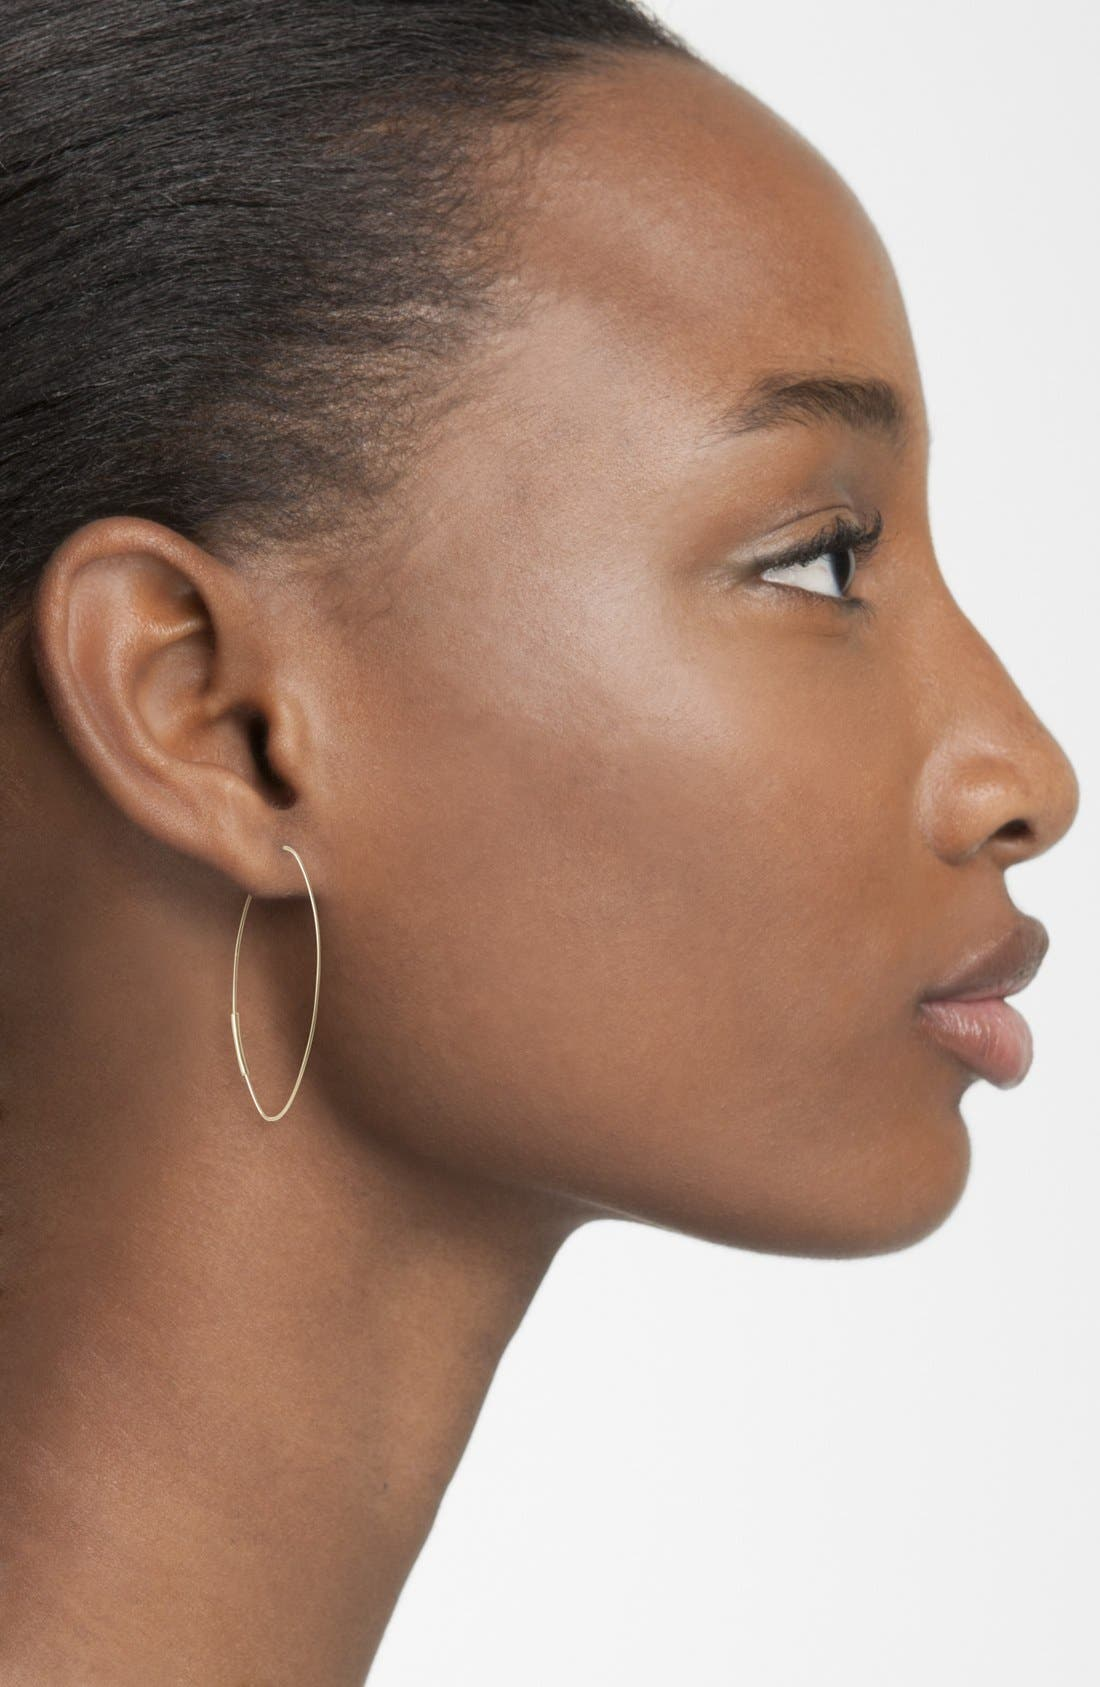 Alternate Image 2  - Lana Jewelry 'Magic' Small Oval Hoop Earrings